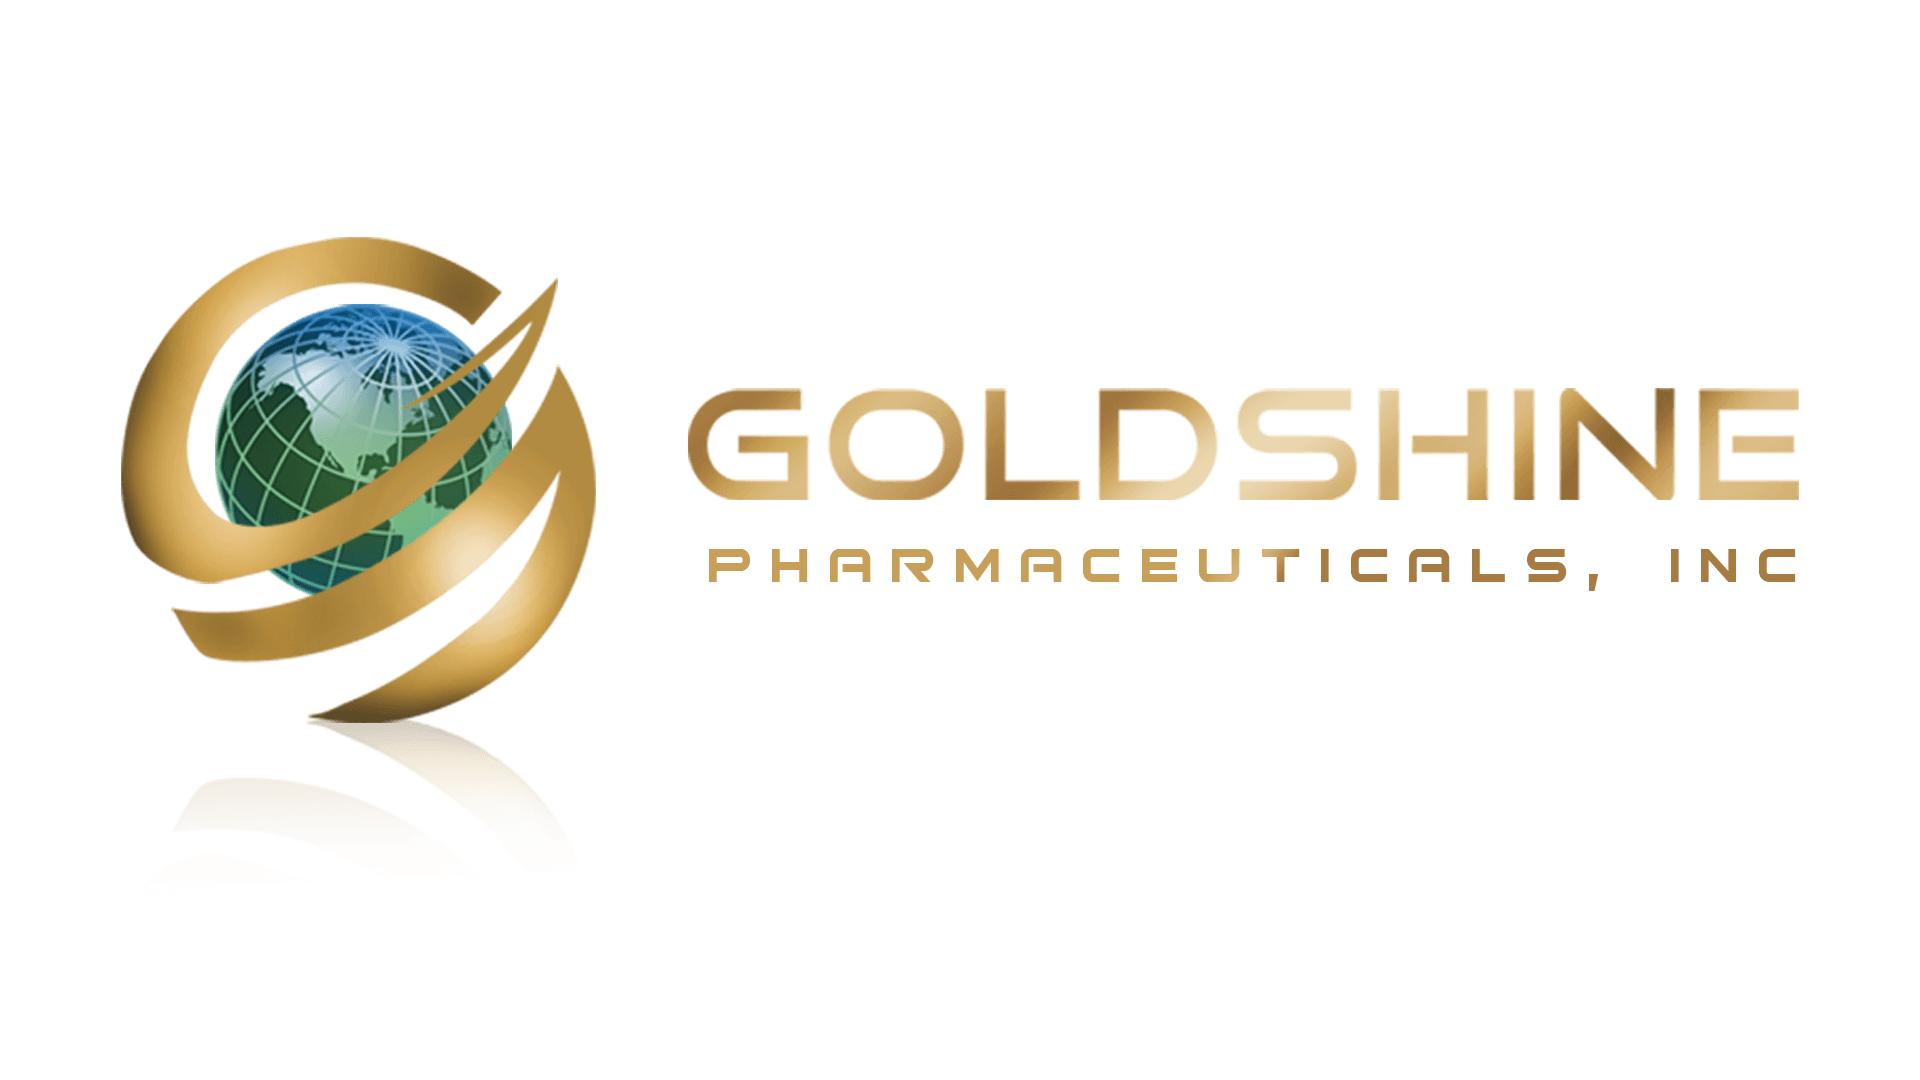 Goldshine